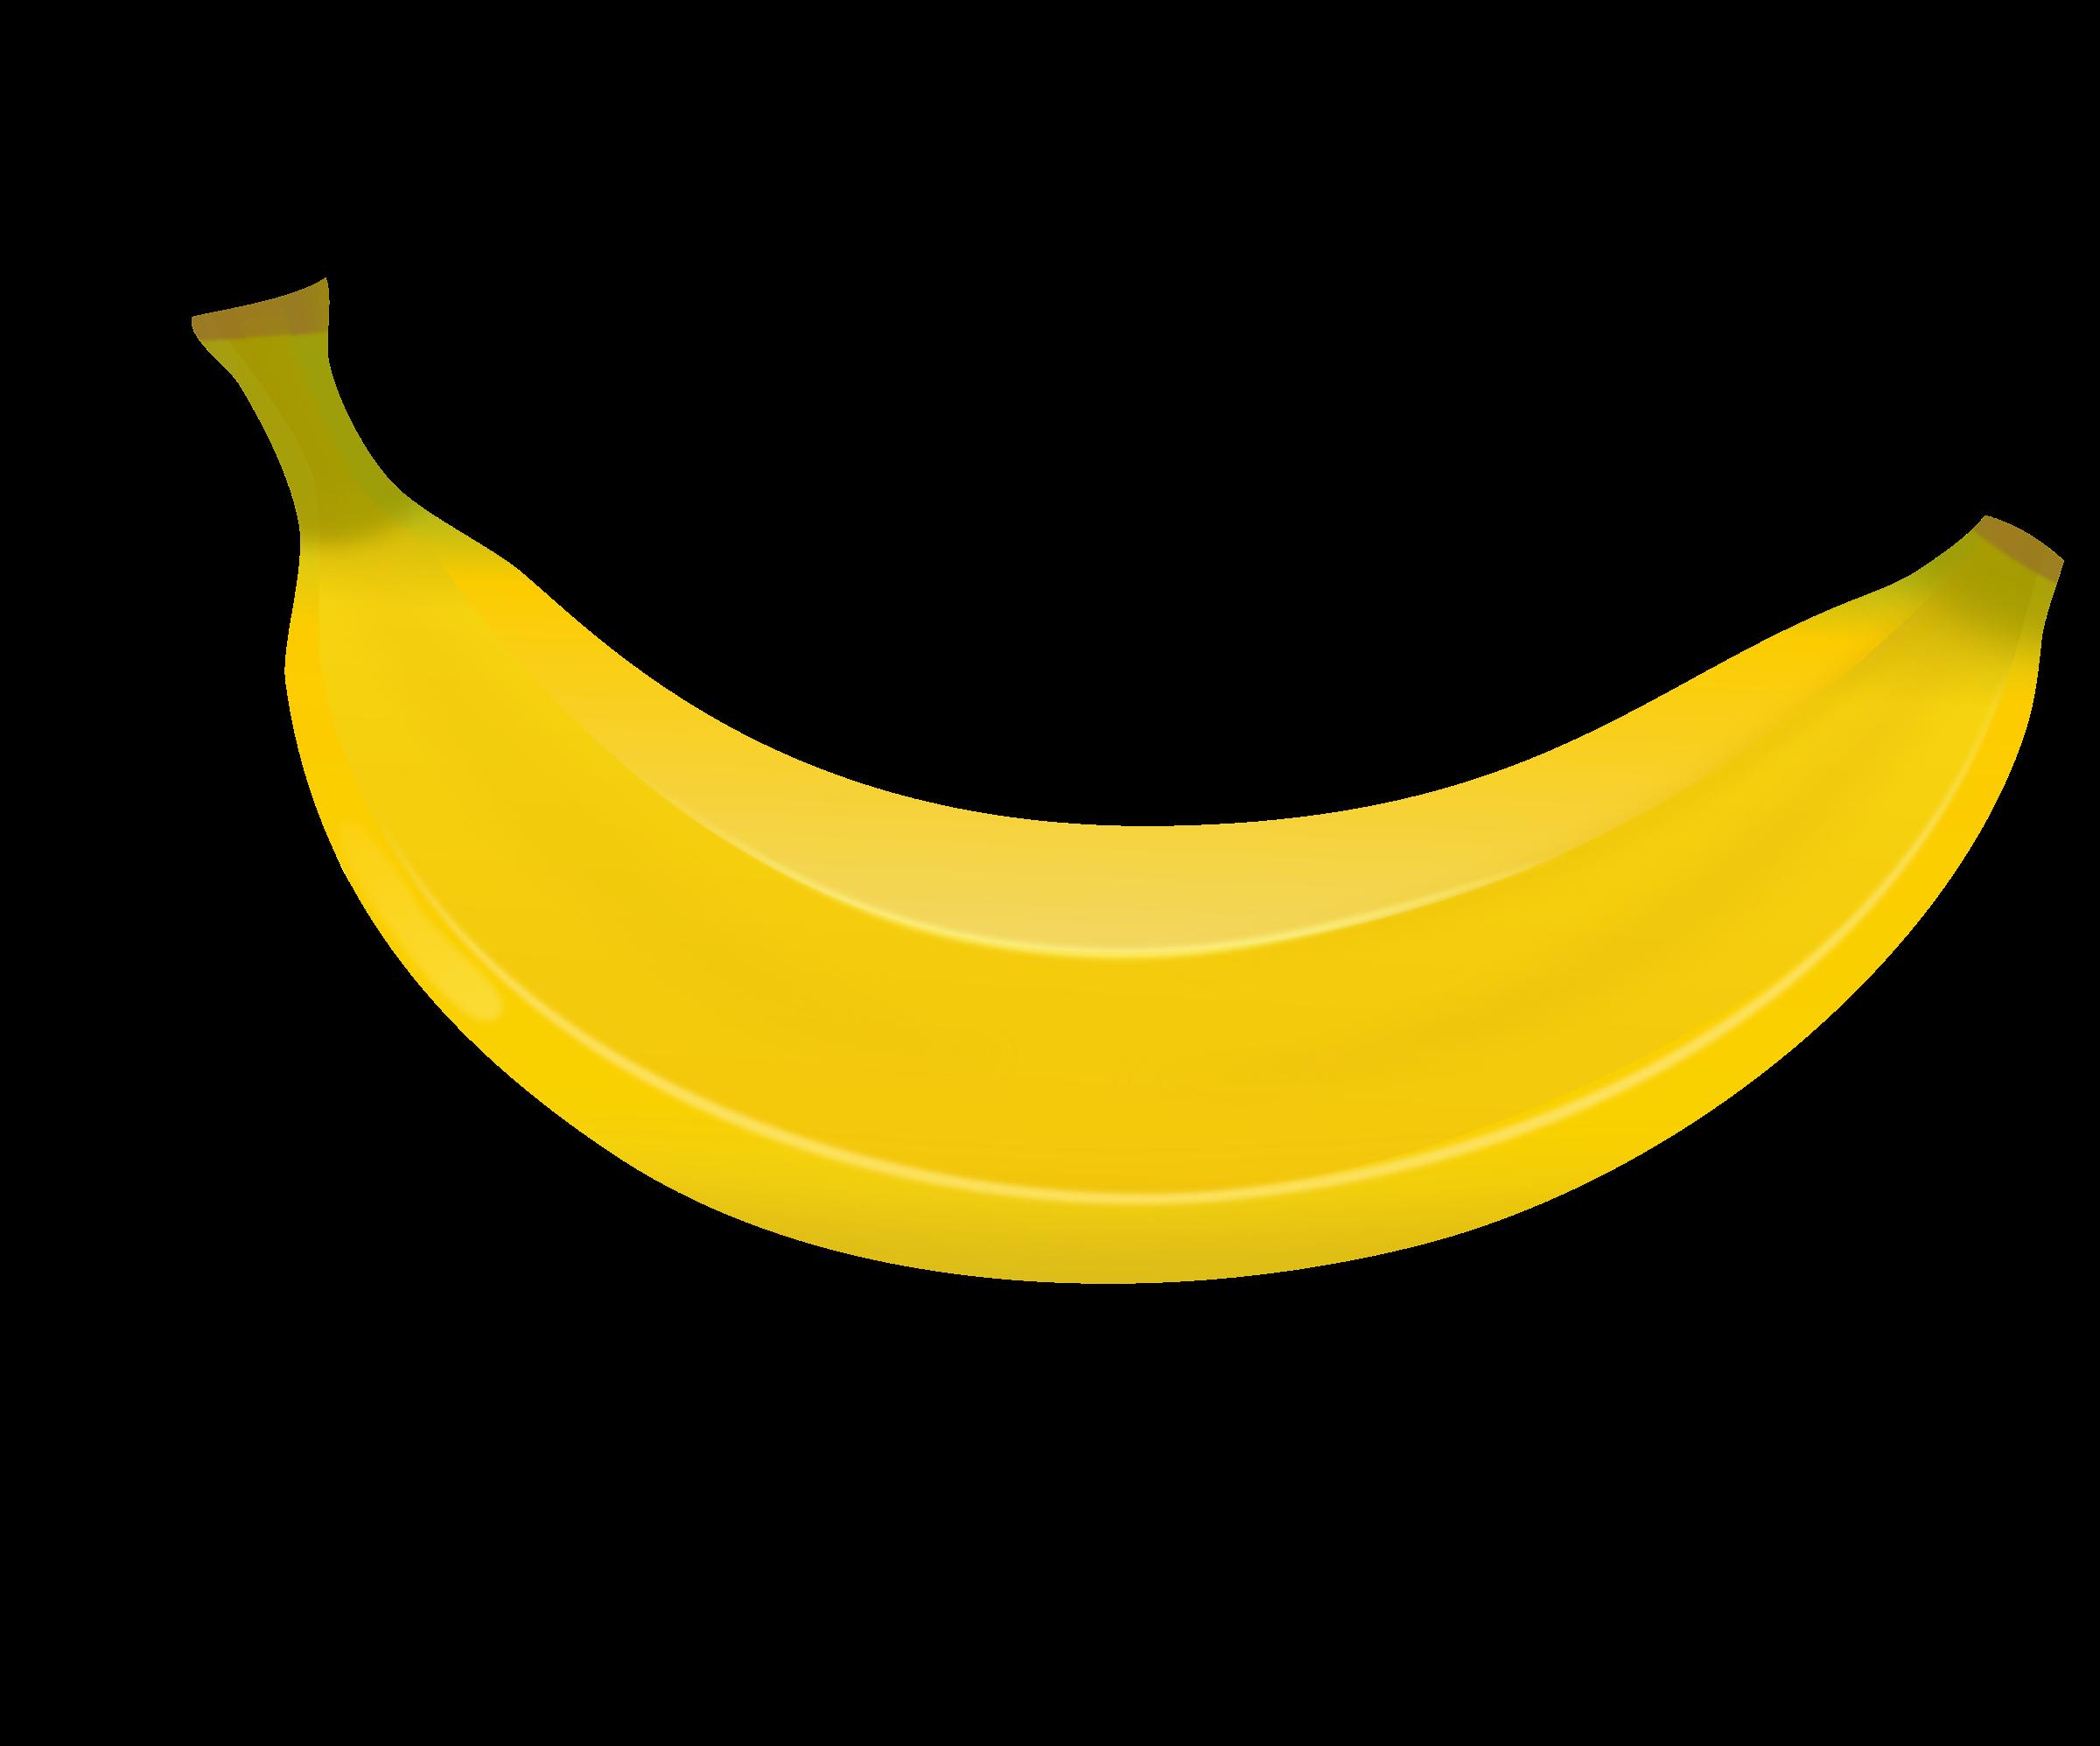 Open Banana Clipart.